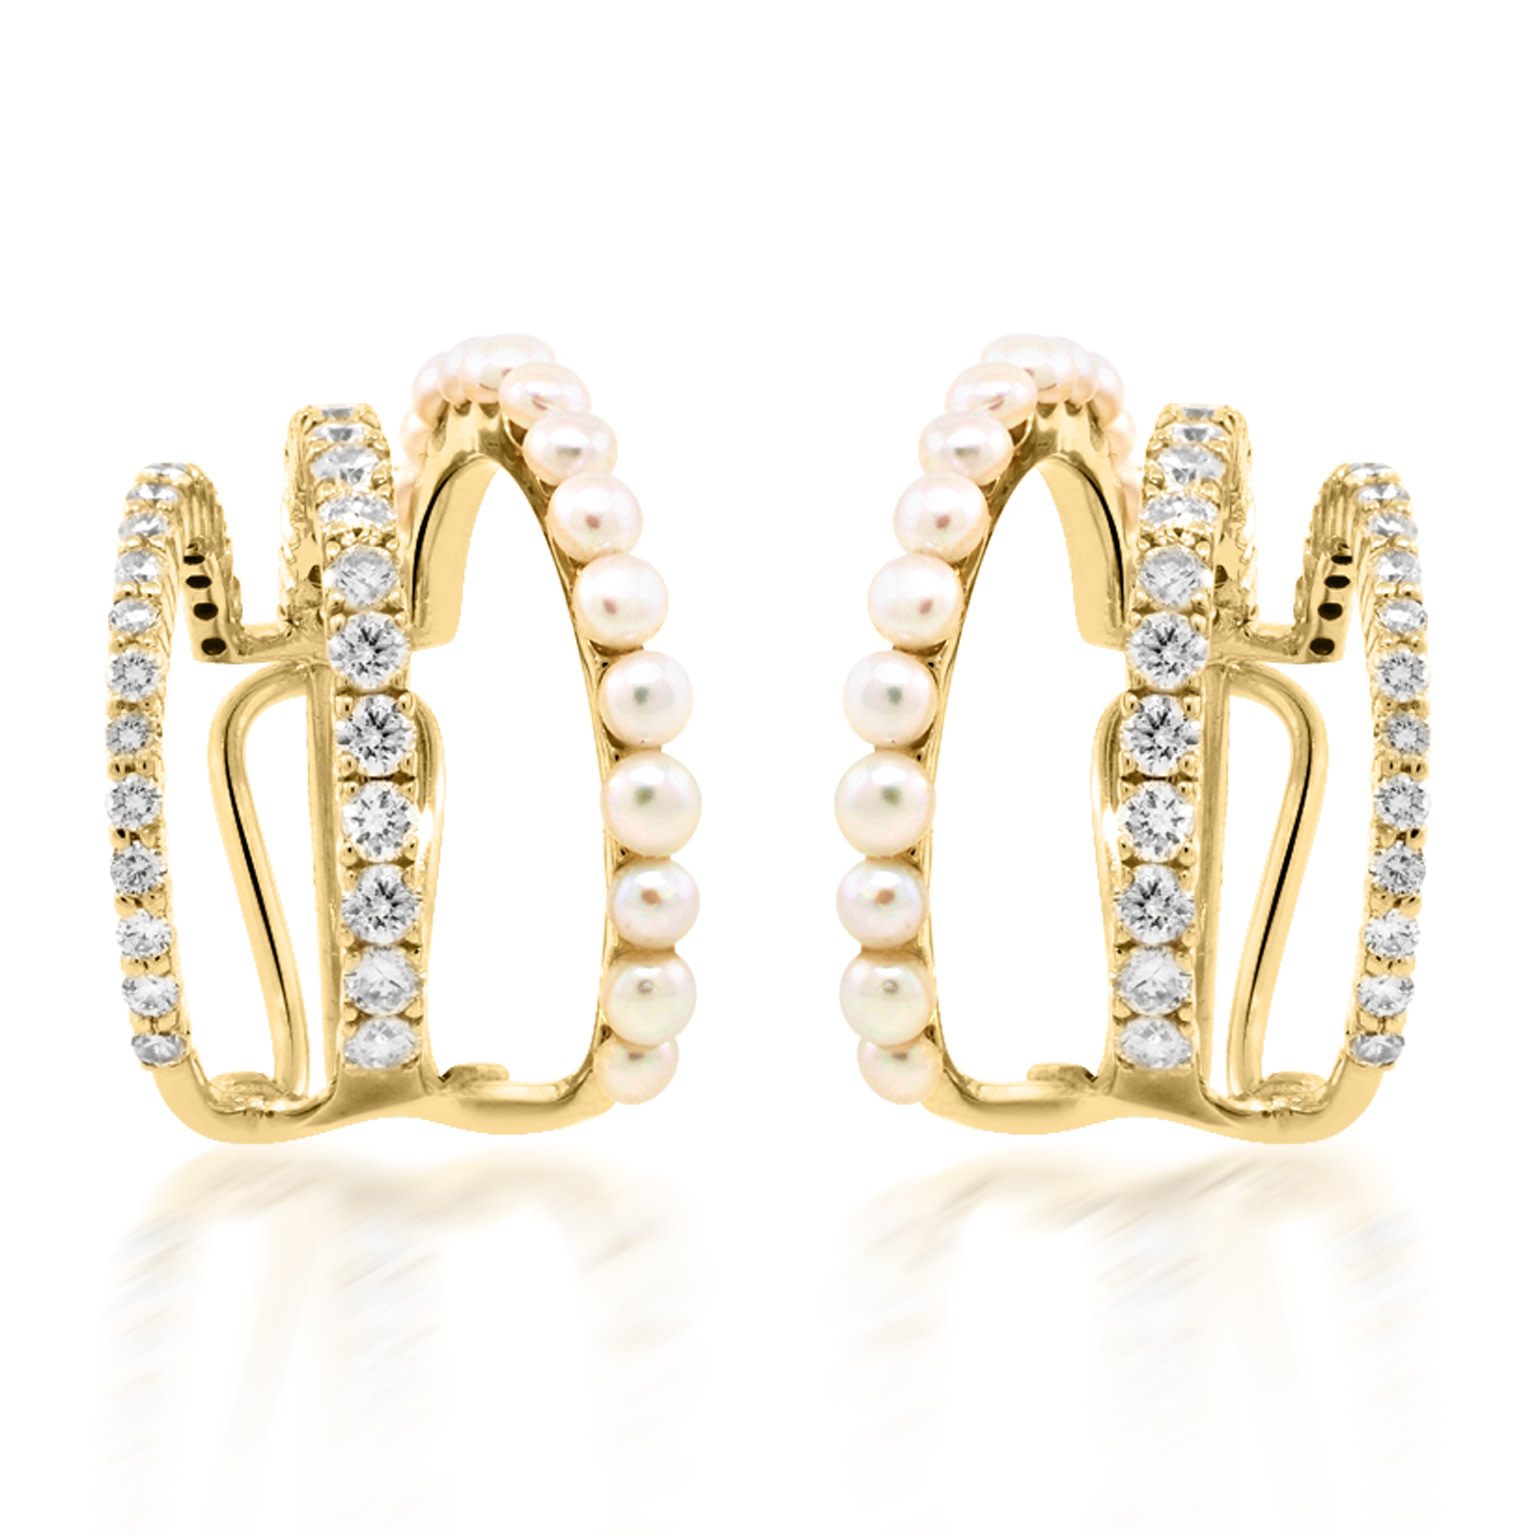 Trabert Goldsmiths Pearl and Diamond Triple Hoop Earrings